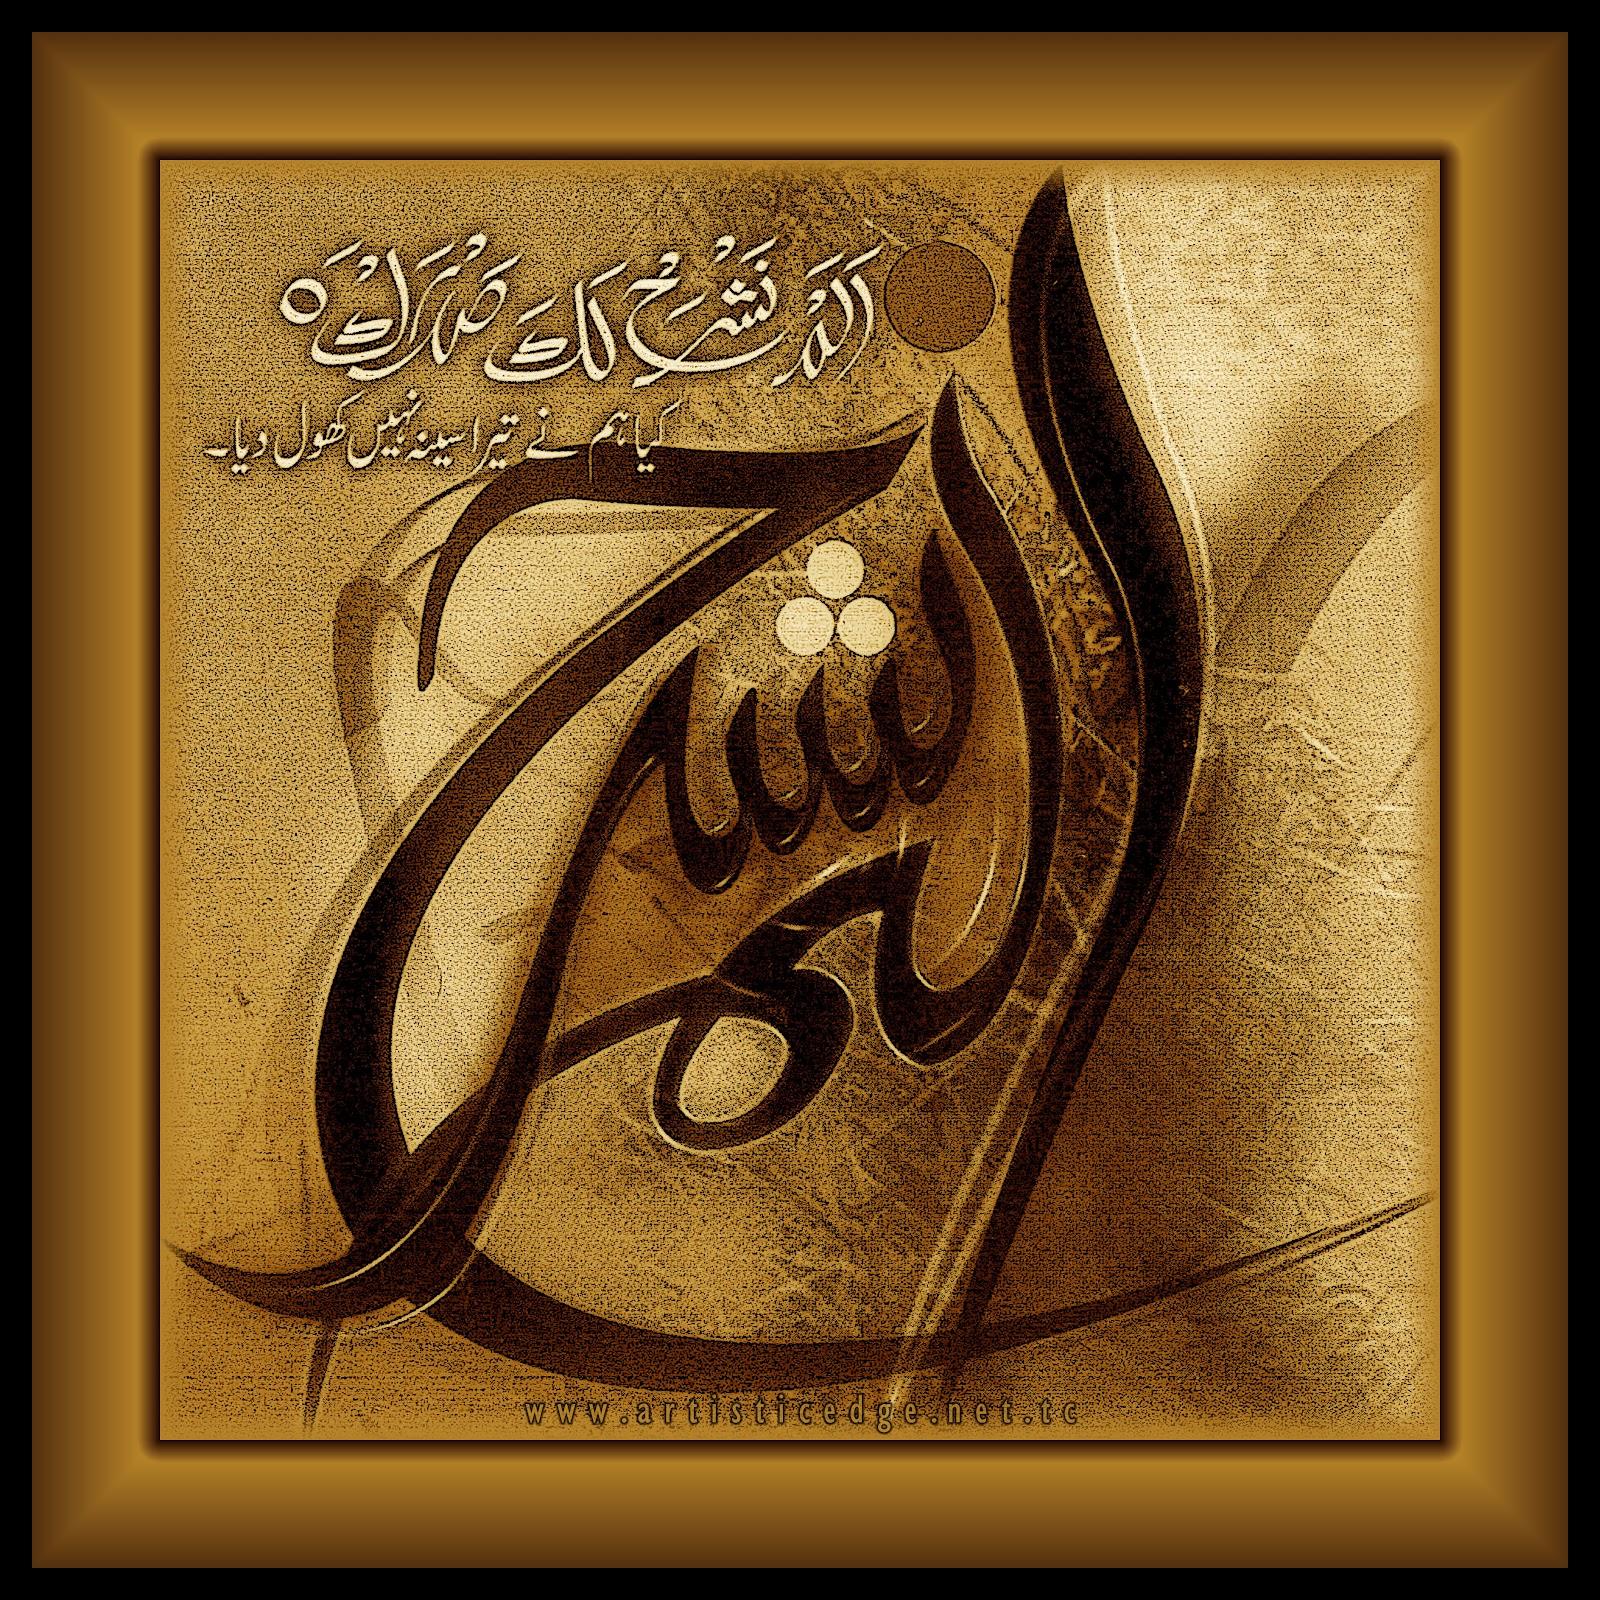 Artistic Edge Ayat E Qurani Artistic Edge